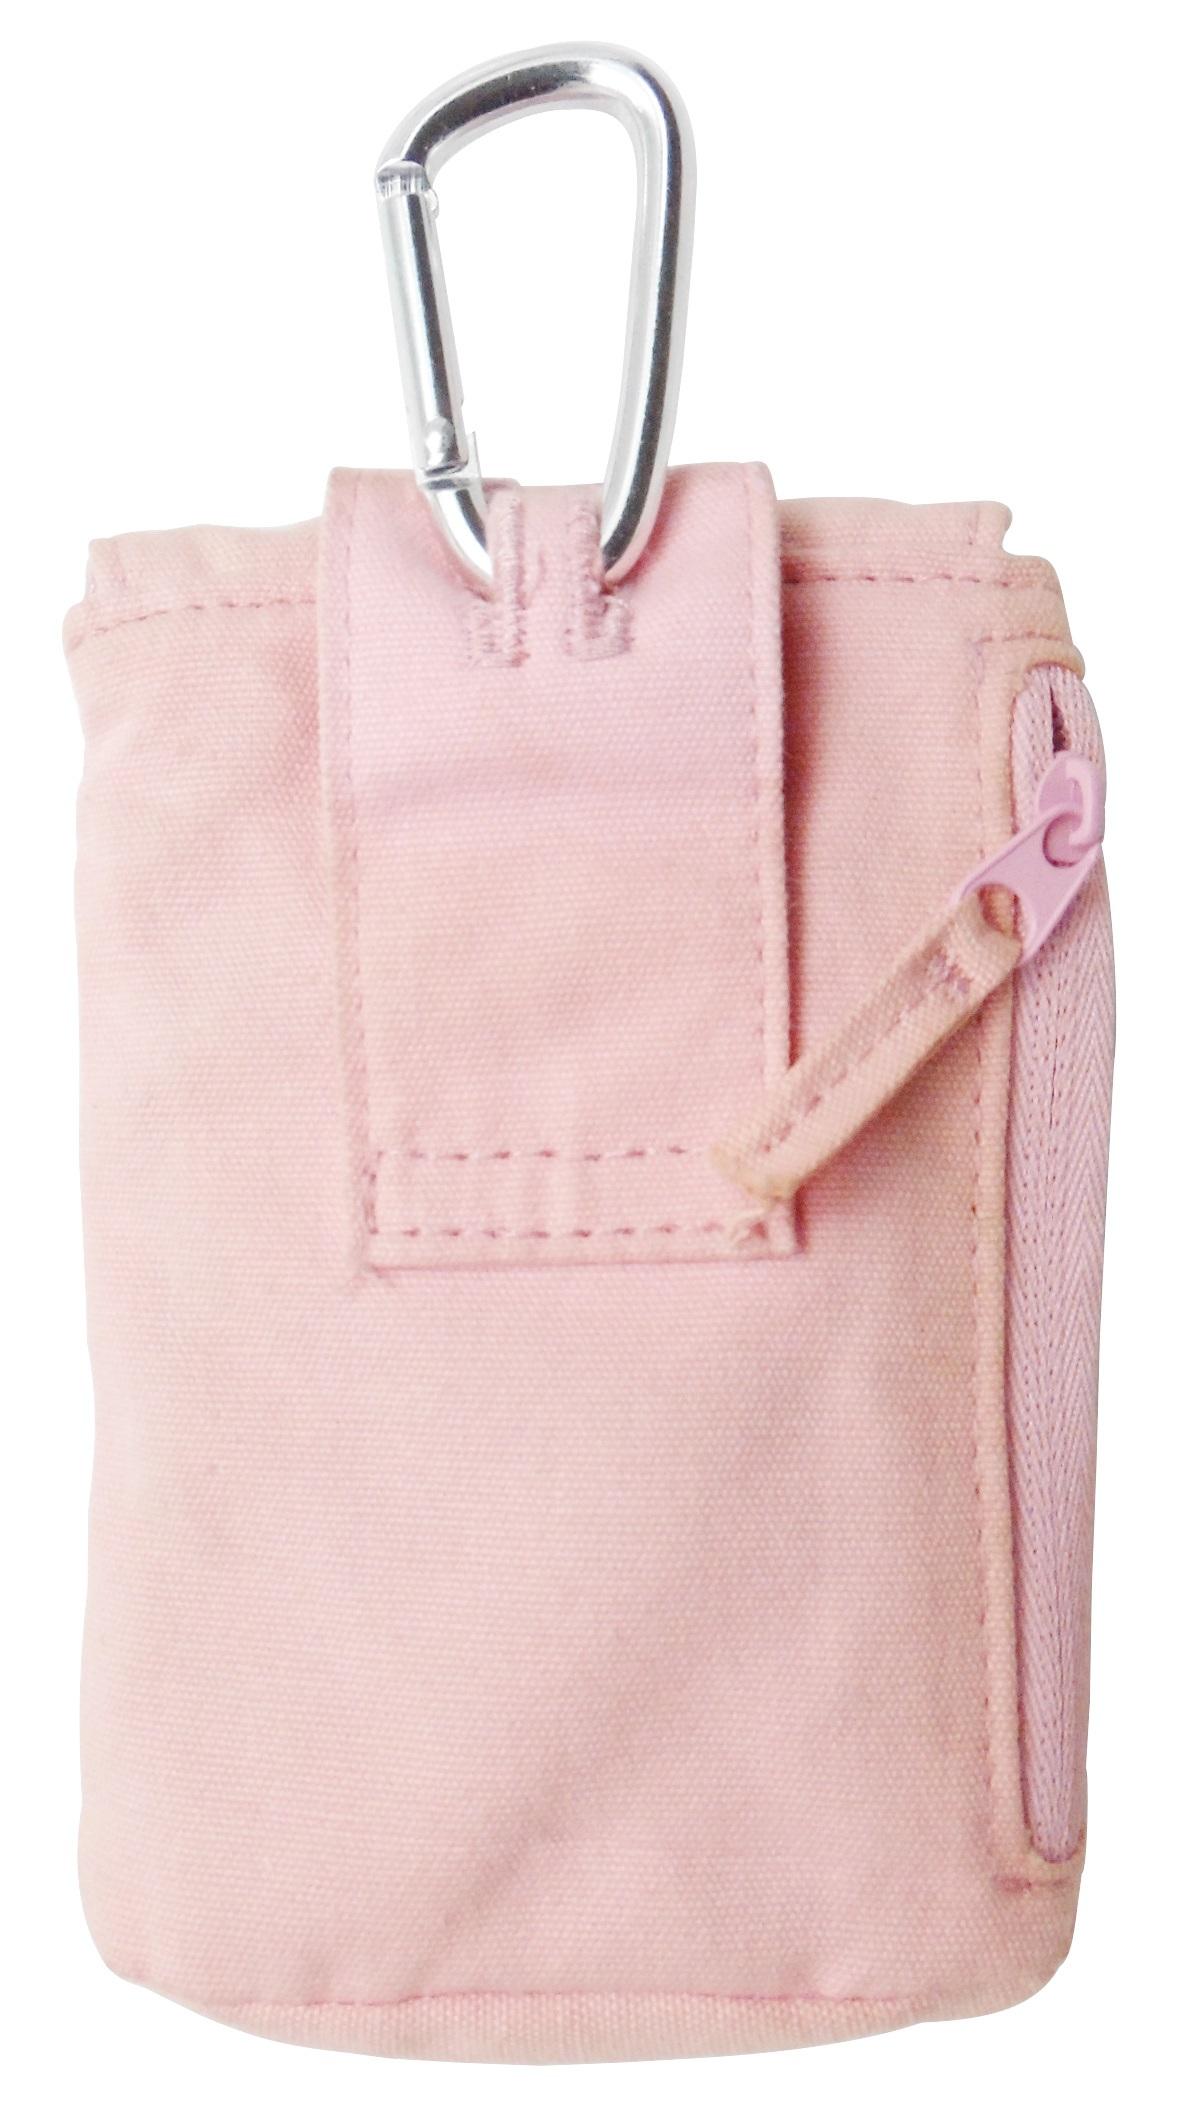 Husa Golla ADELE MUSIC G258 tip borseta roz pentru telefoane, MP3